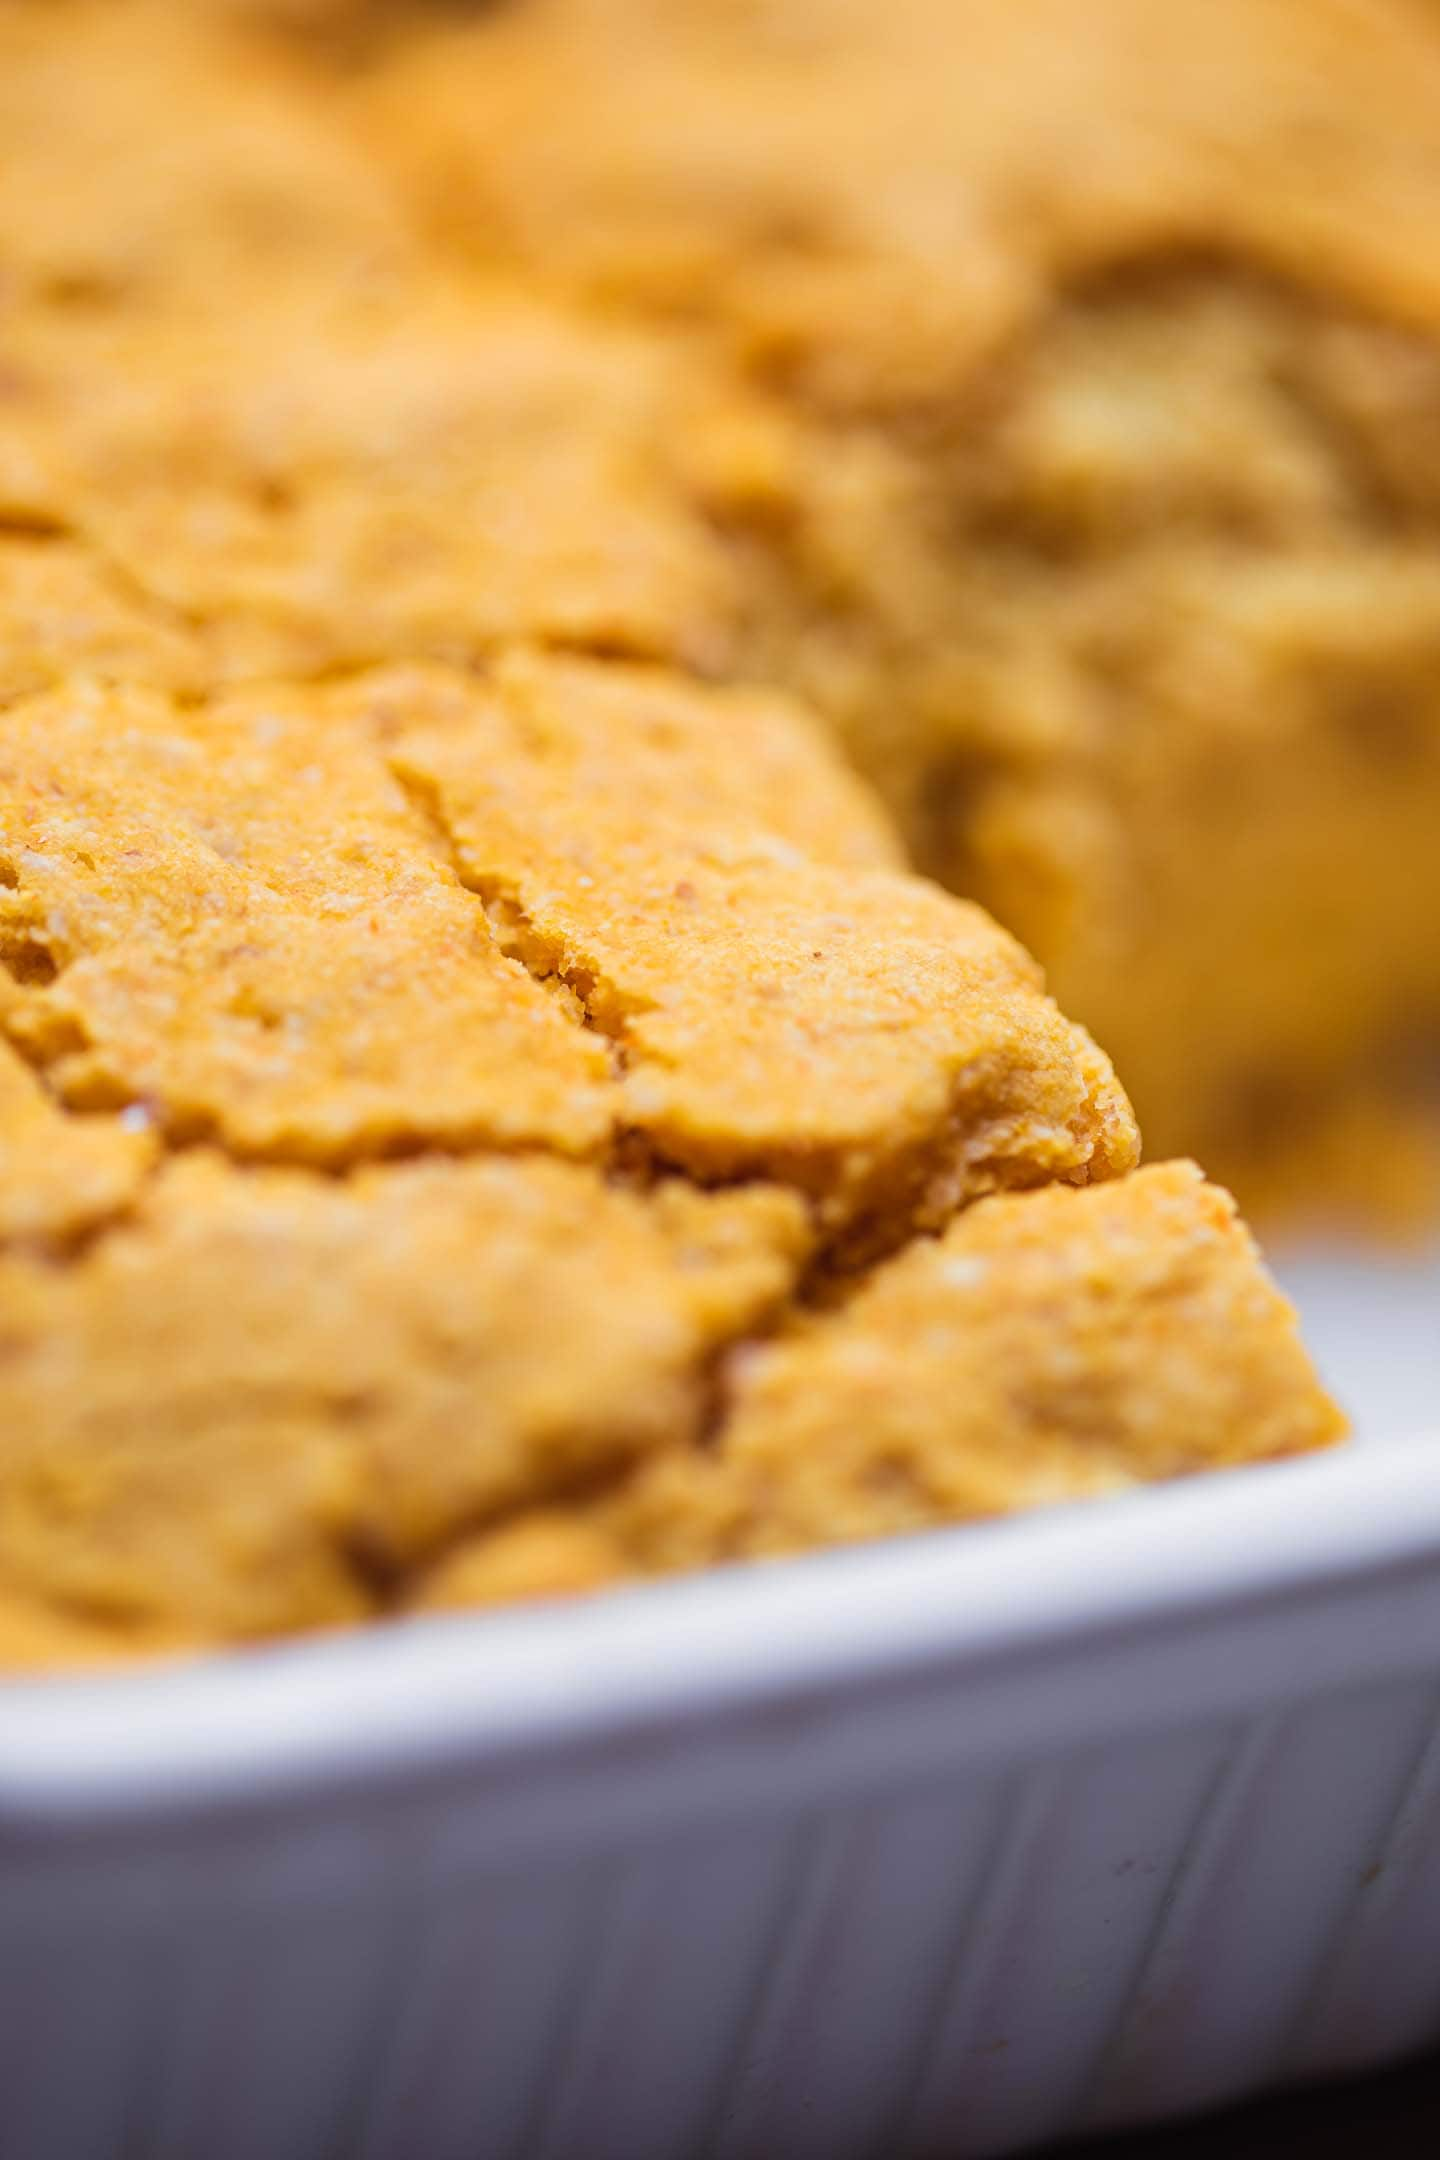 Closeup of cornbread in a baking dish